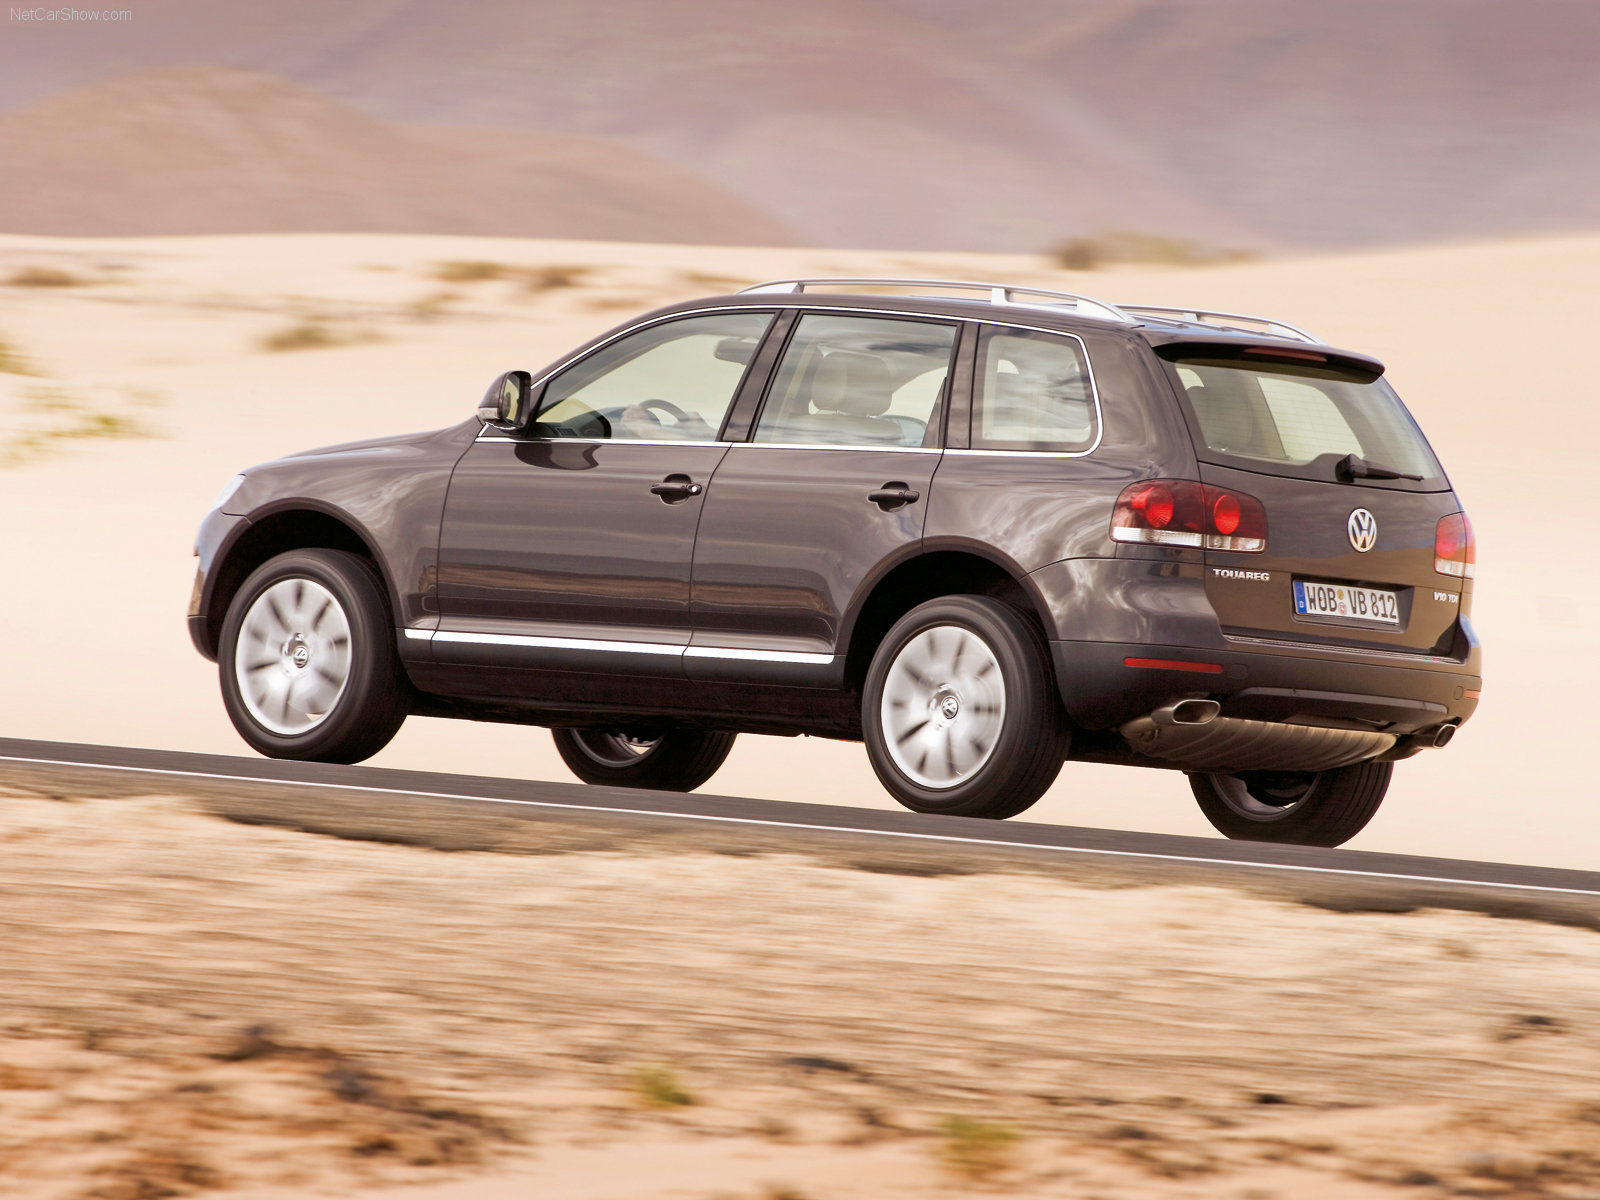 https://w04.ru/foto/Volkswagen-Touareg_2007_1600x1200_wallpaper_1a.jpg